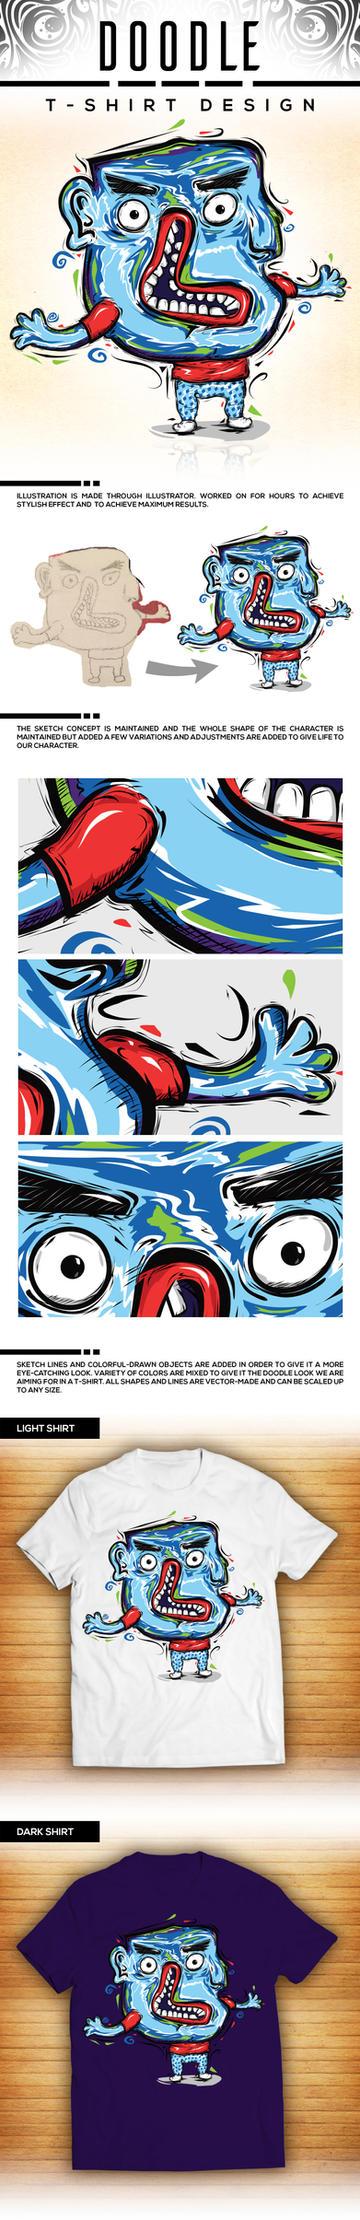 Doodle Shirt Design by tmaclabi